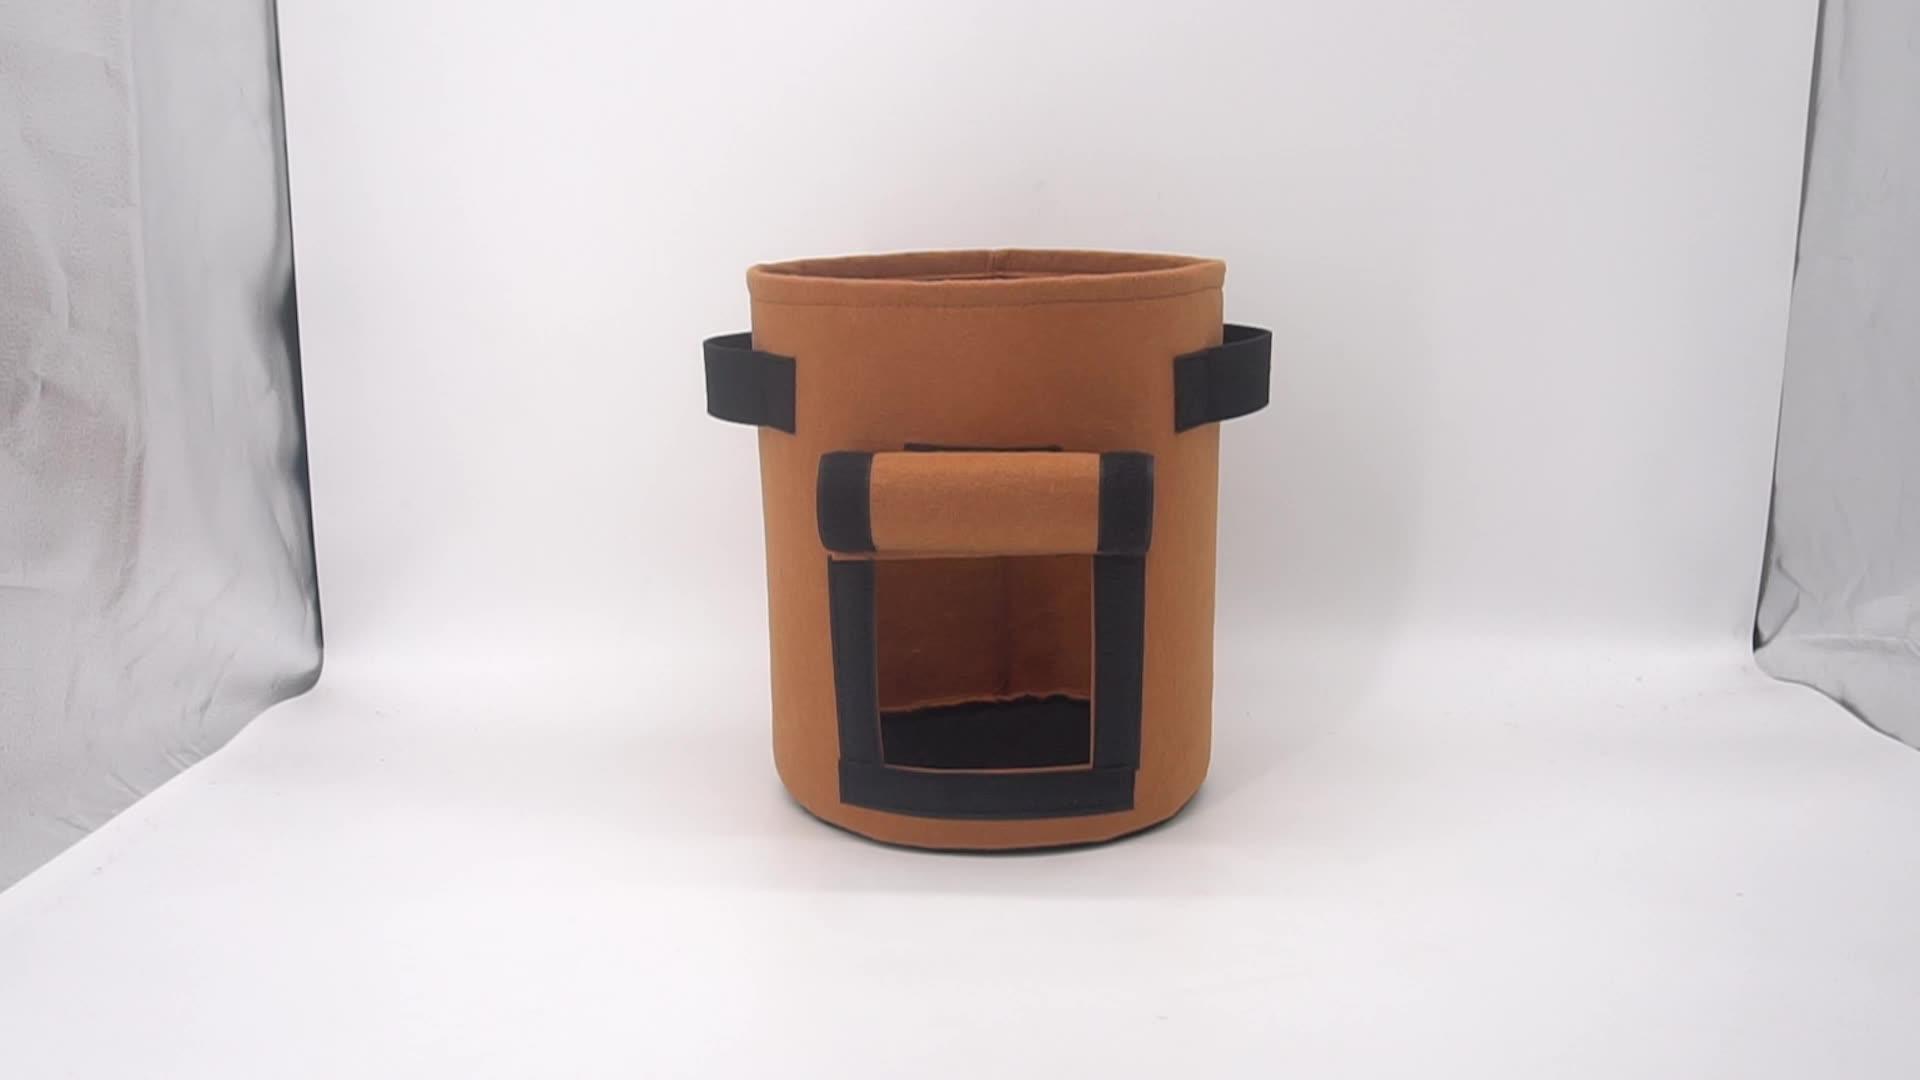 Handmade Eco-friendly Felt Fabric Plant Grow Bags Nursery Garden Grow Pots with Strap Handles